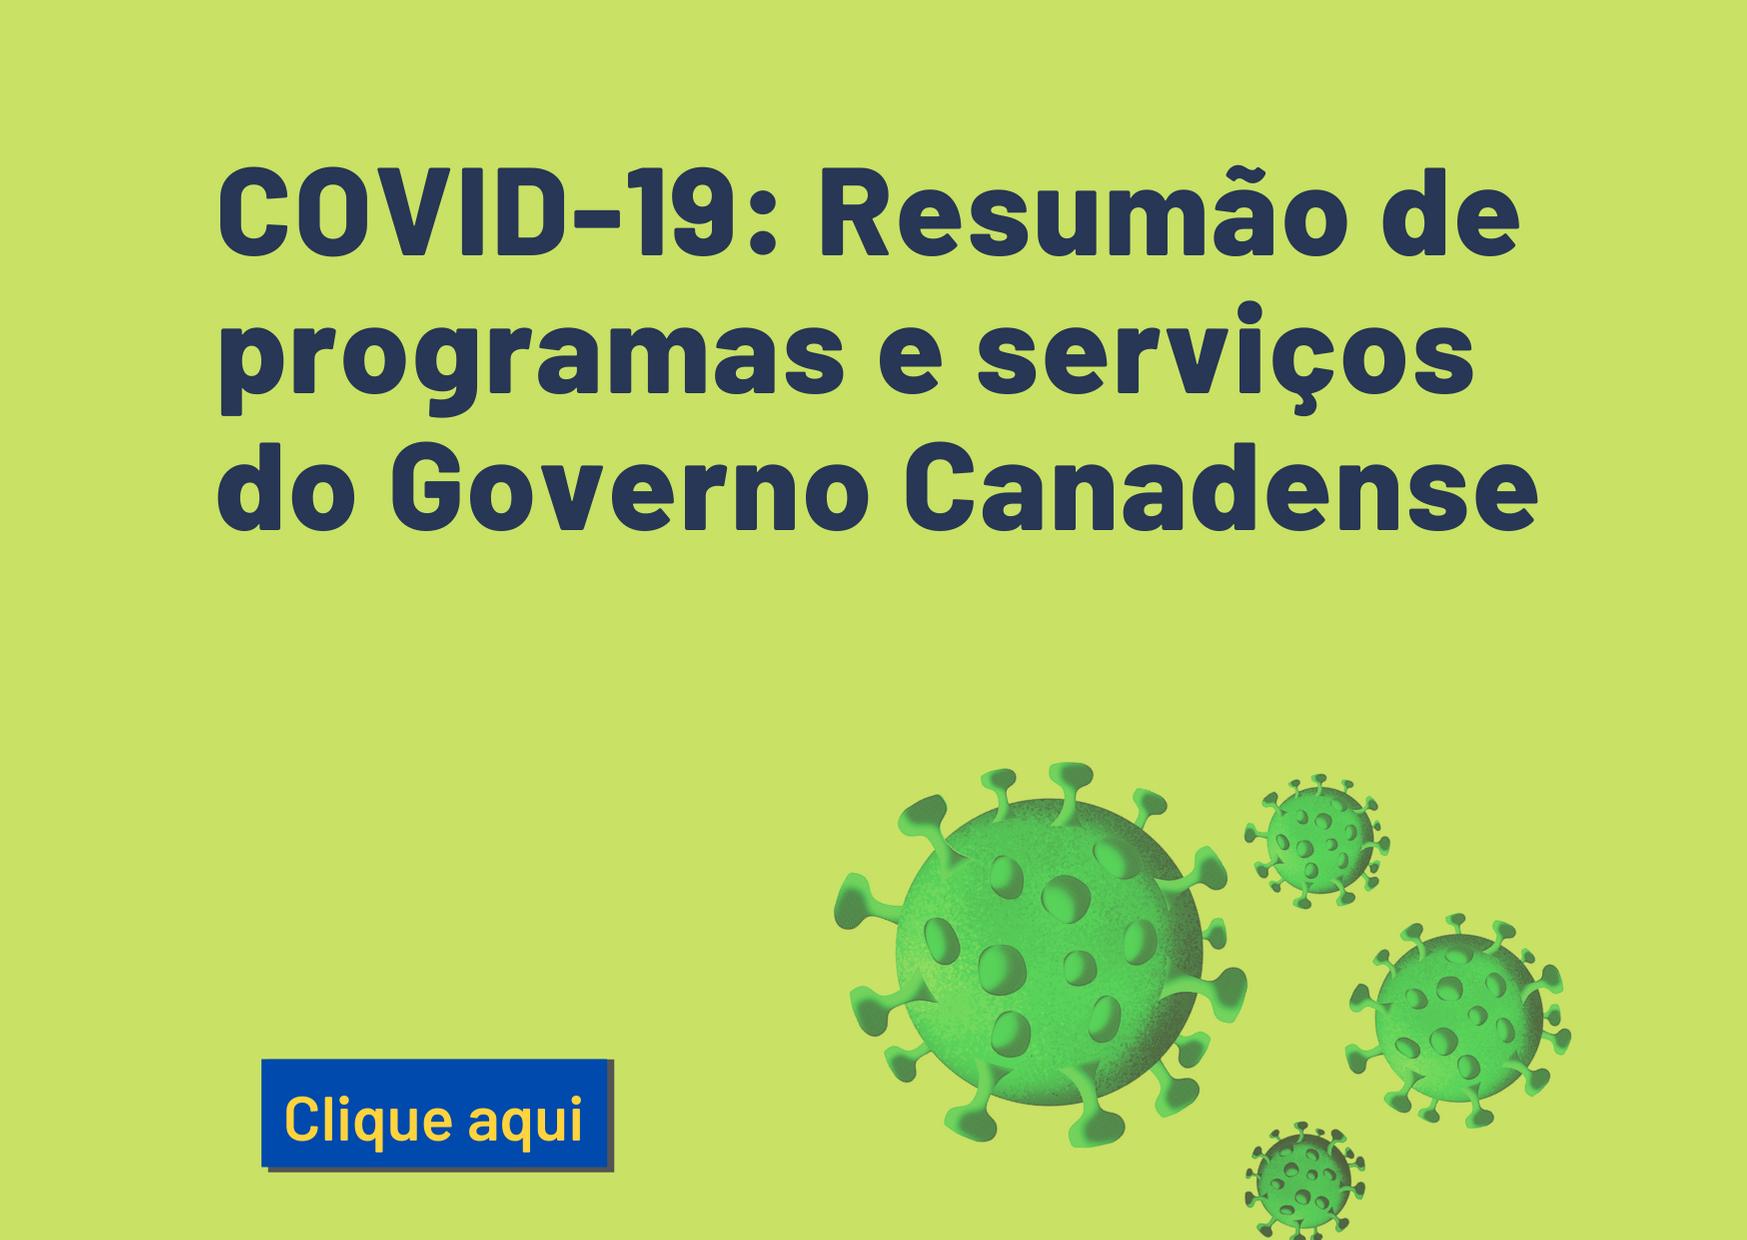 Resumao programas do Canada - Covid-19